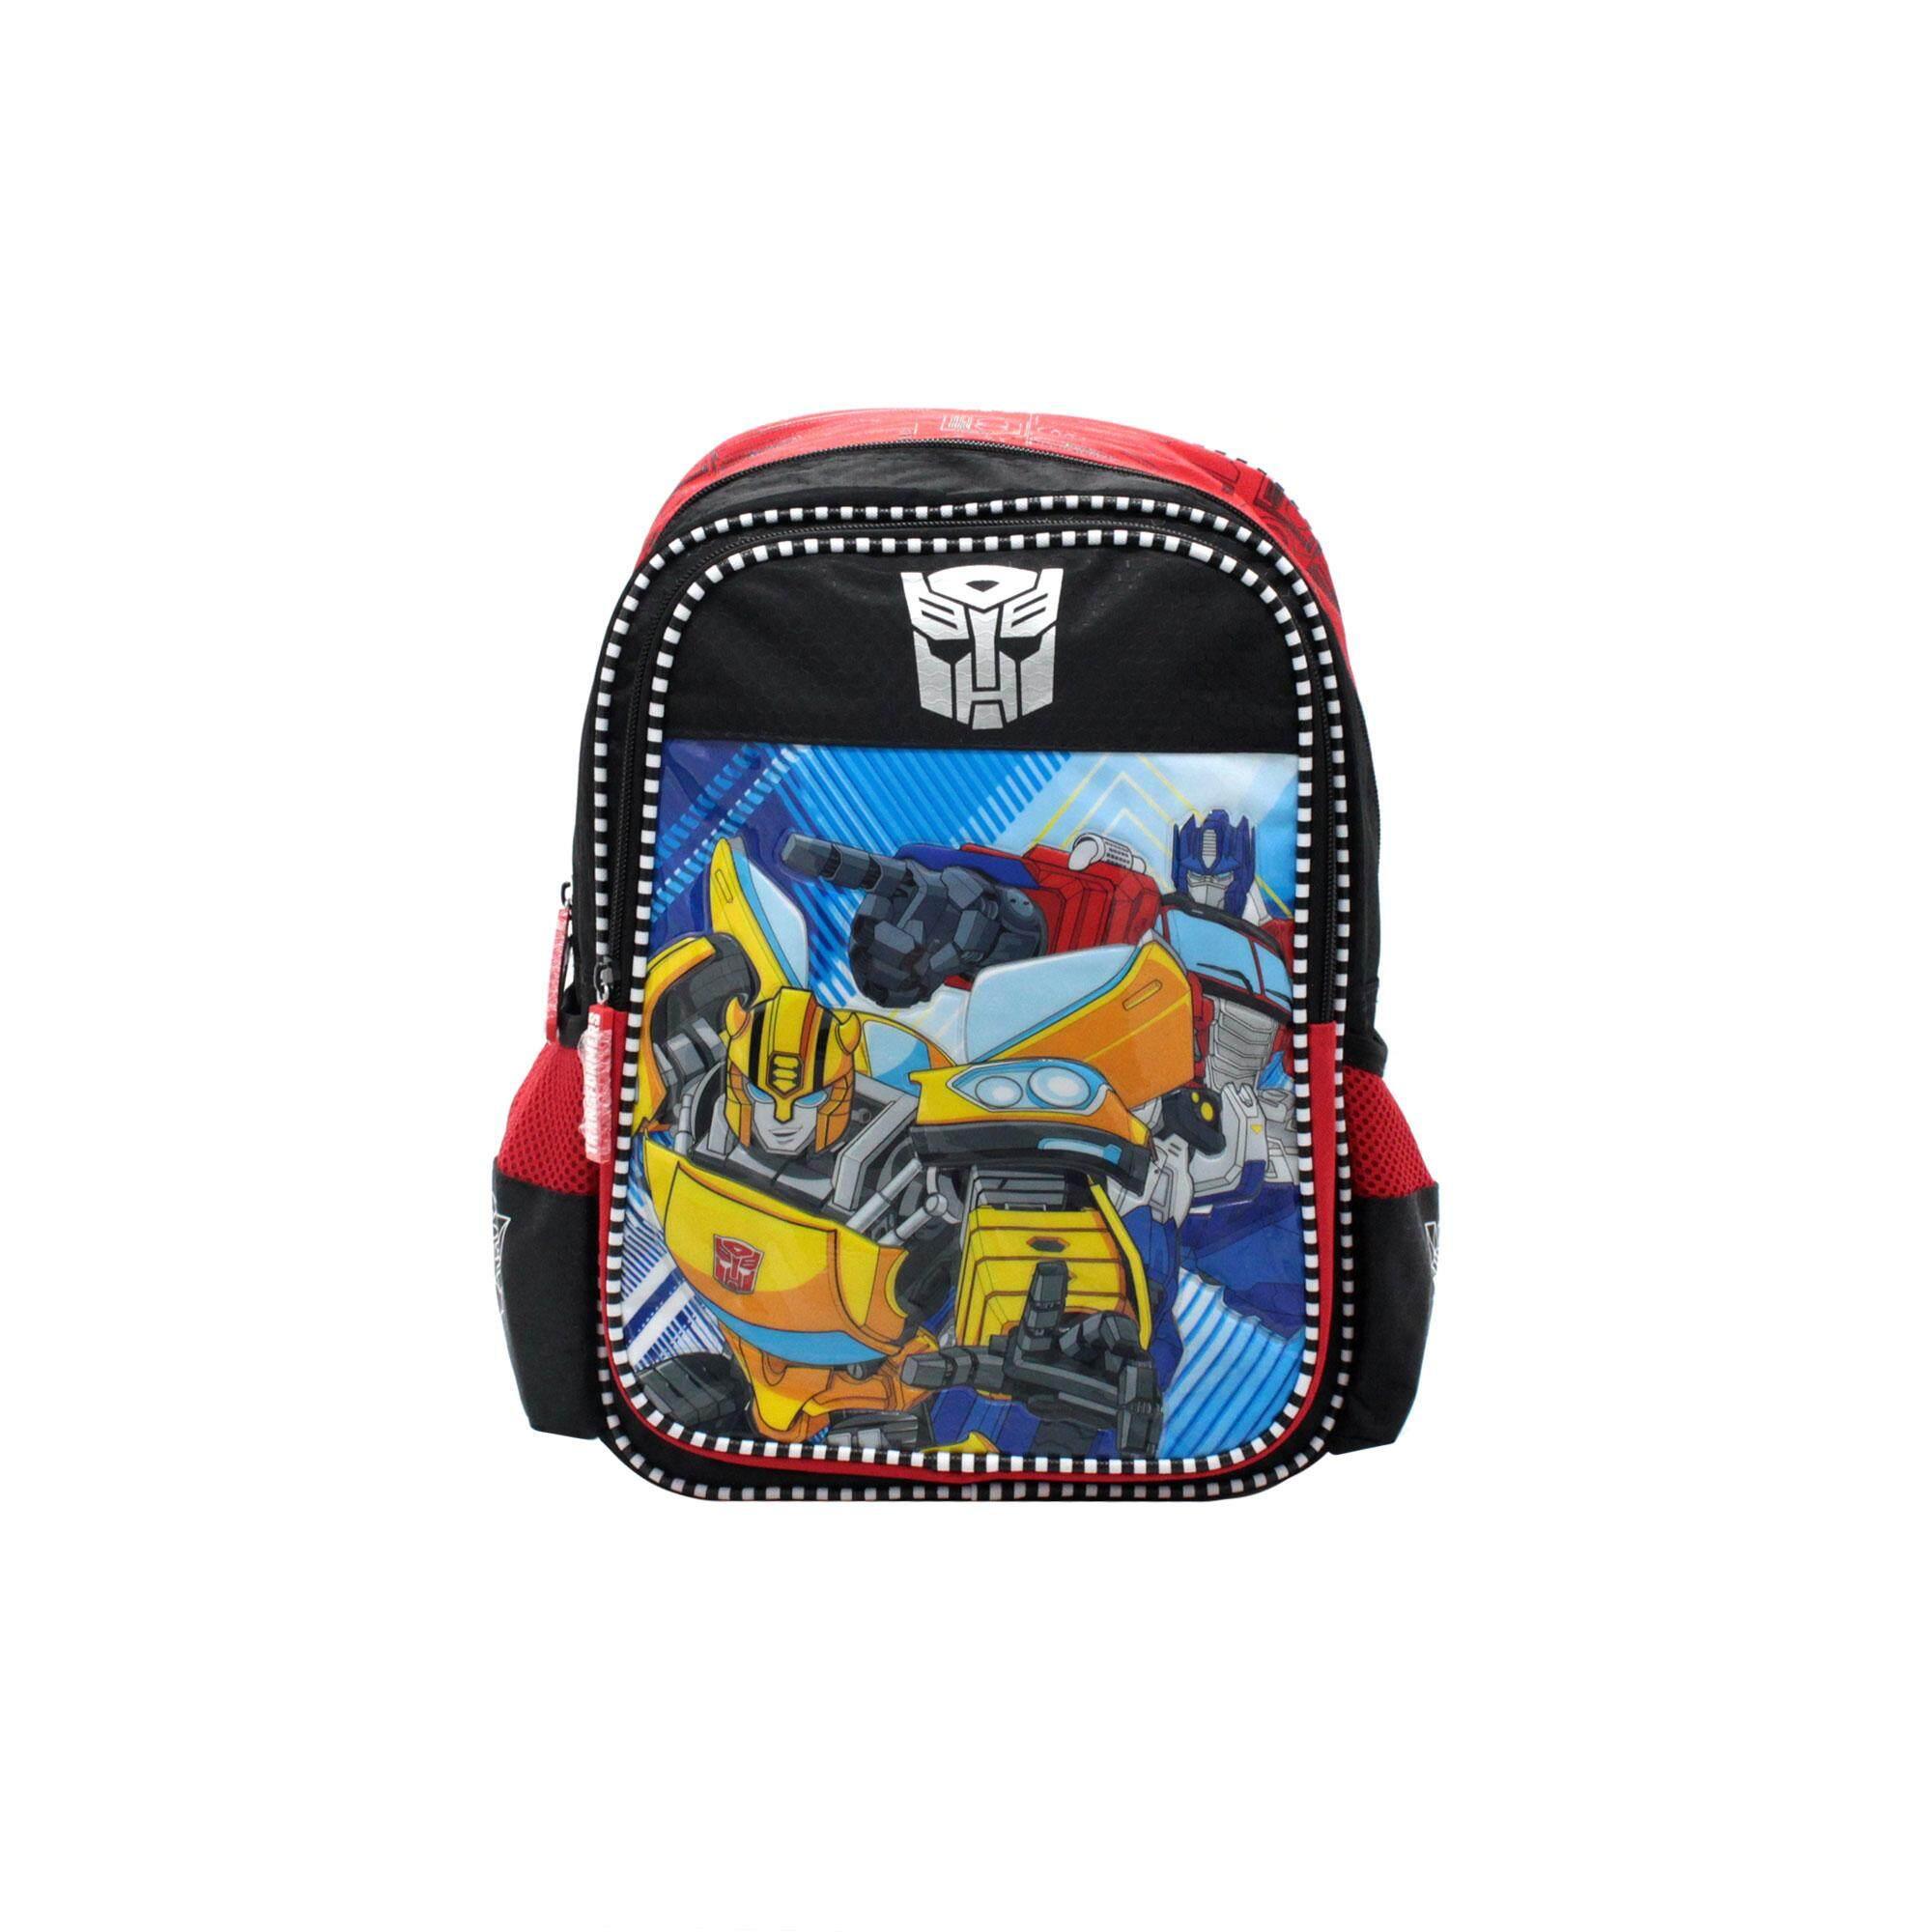 Transformers Bumblebee & Optimus Prime Pre School Bag - Red Colour